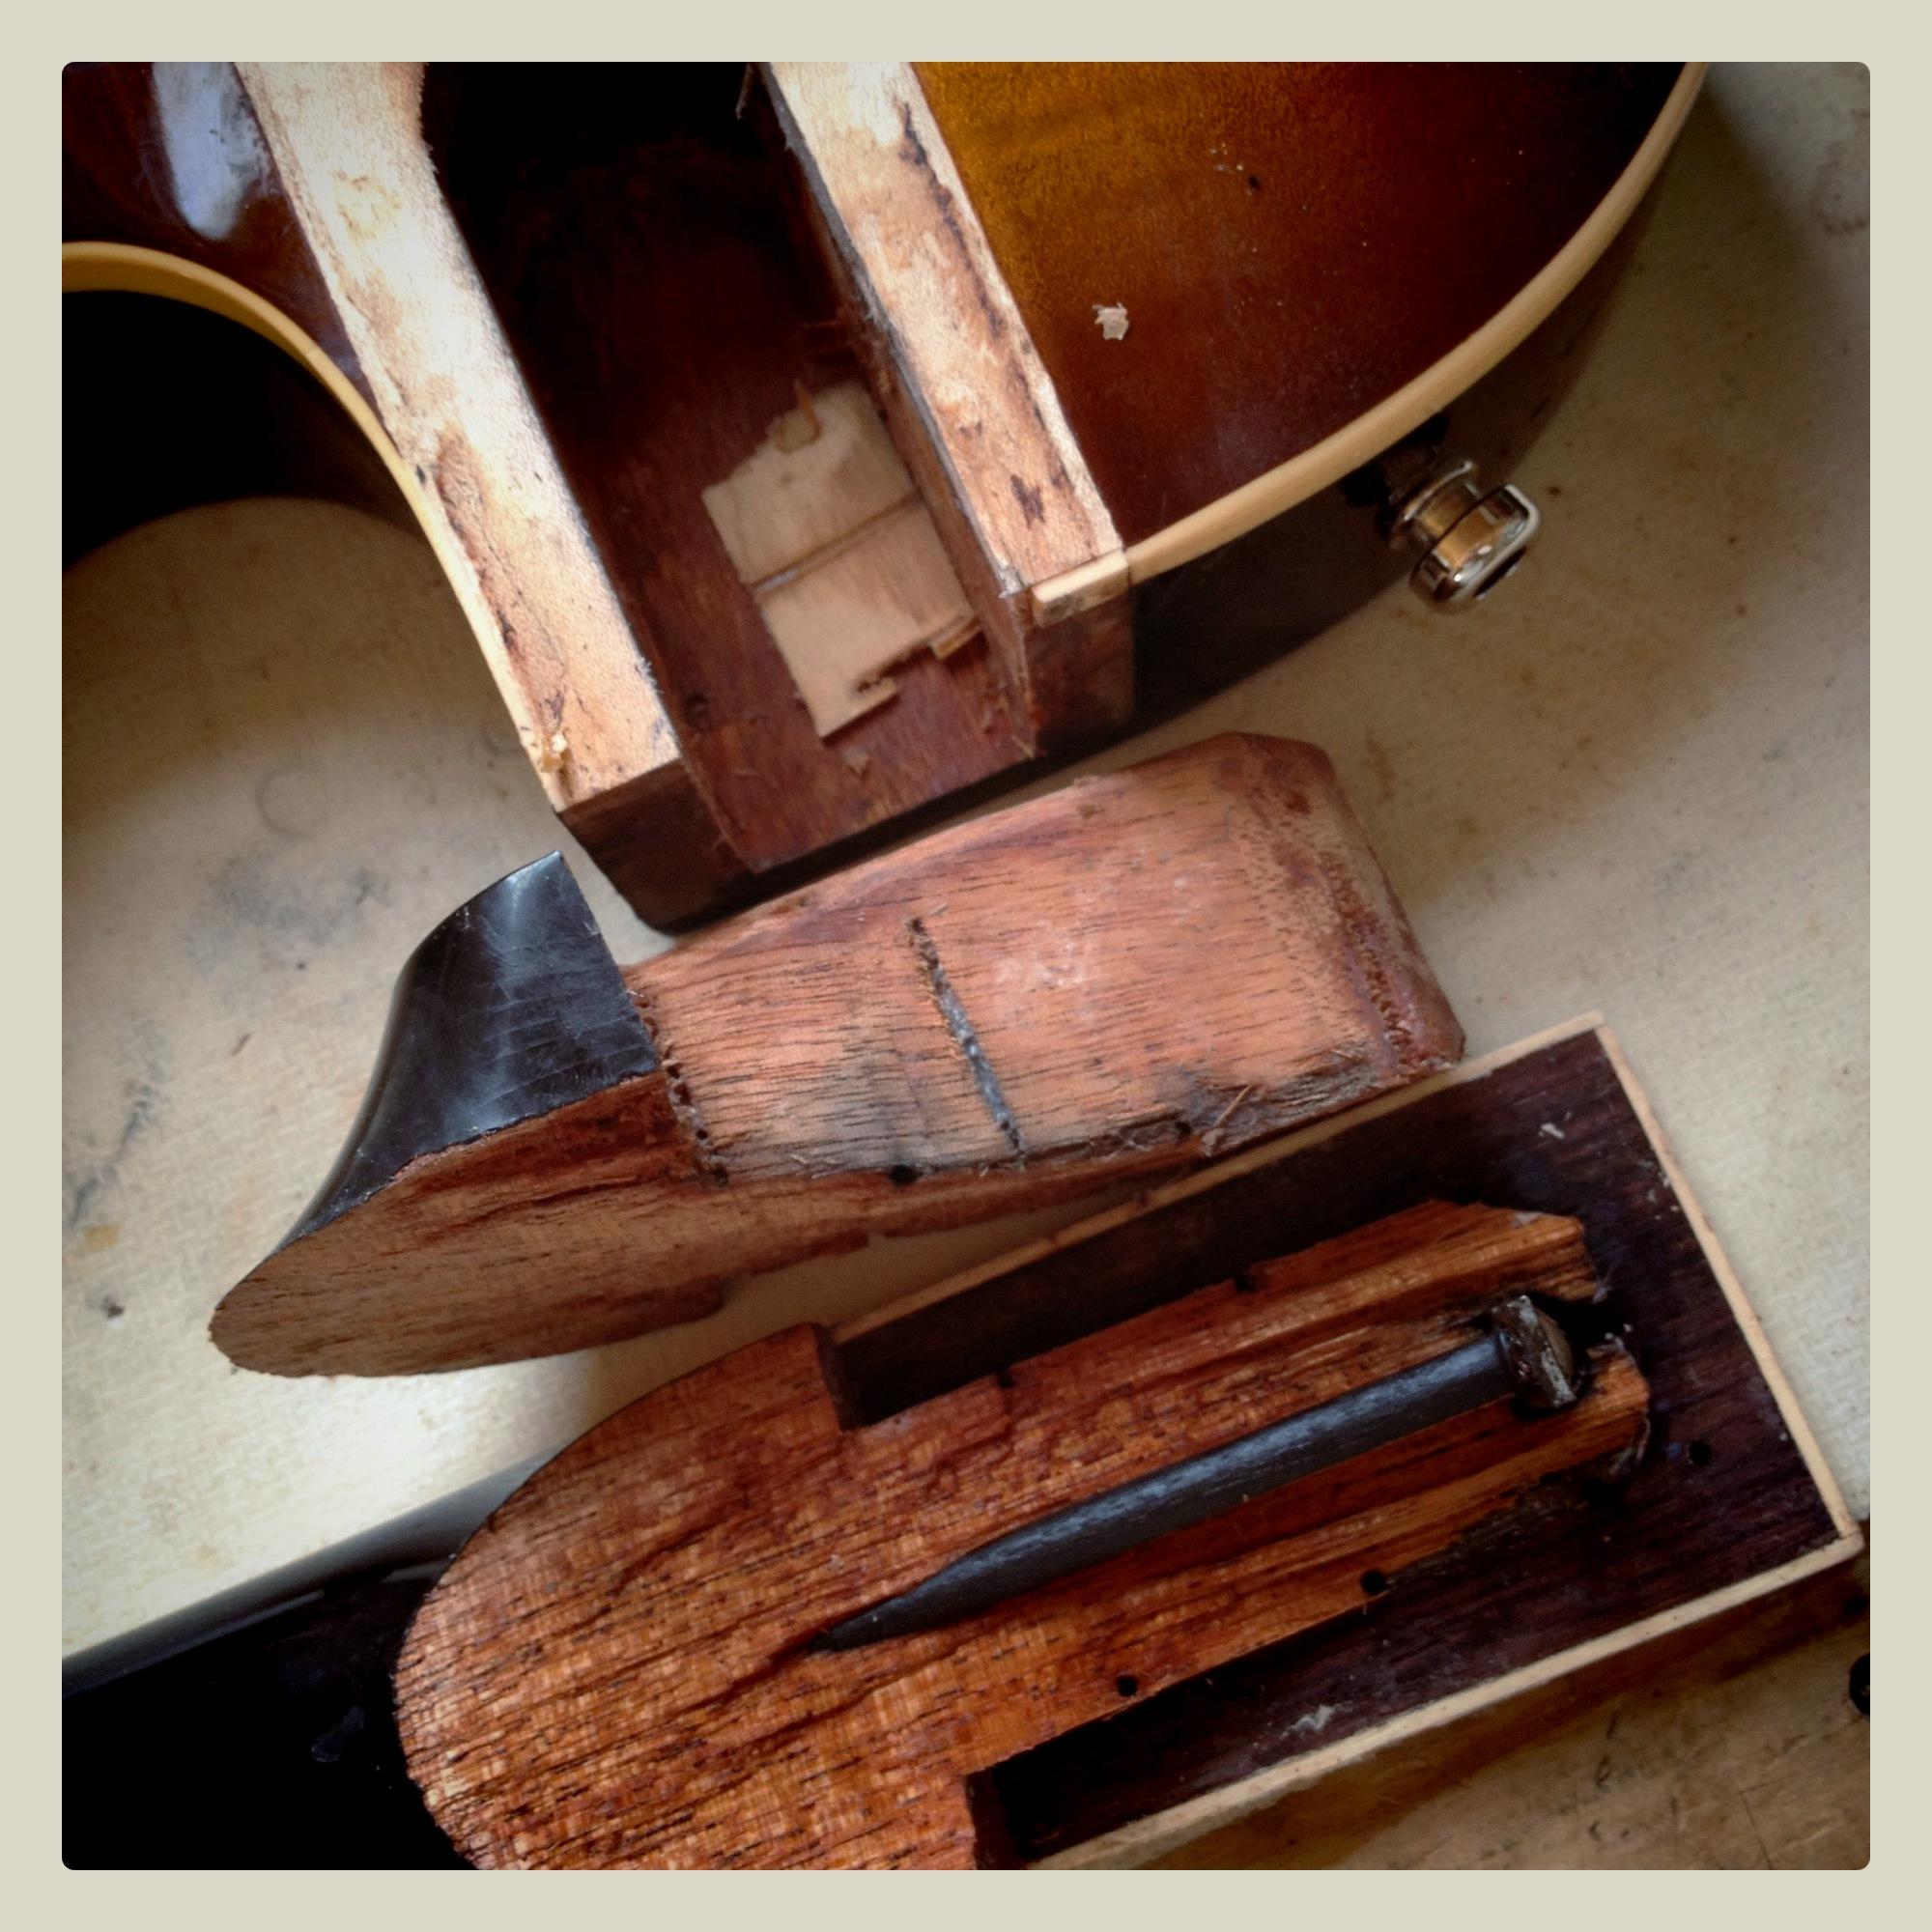 Les Paul neck removed to repair broken heel